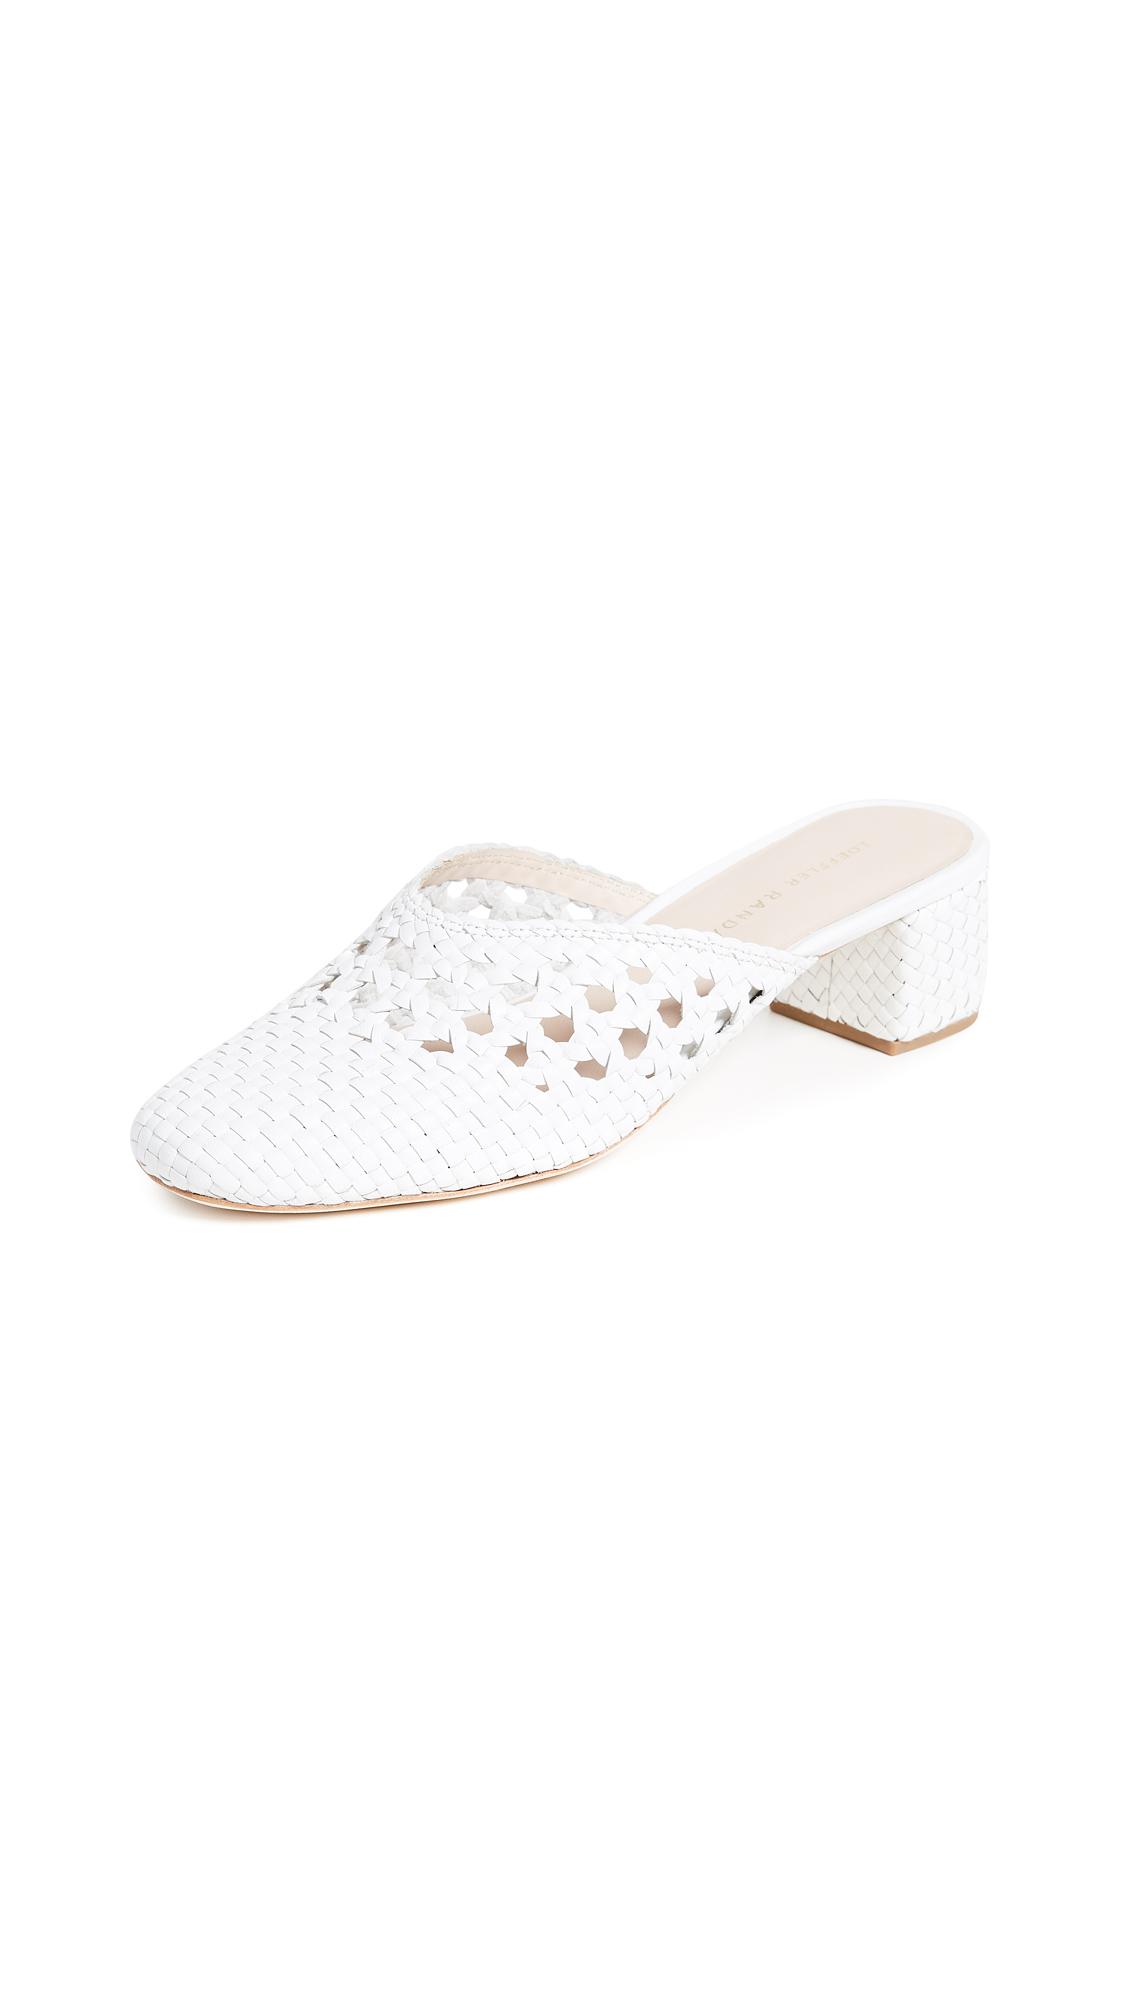 Loeffler Randall Lulu Square Toe Mules - Optic White